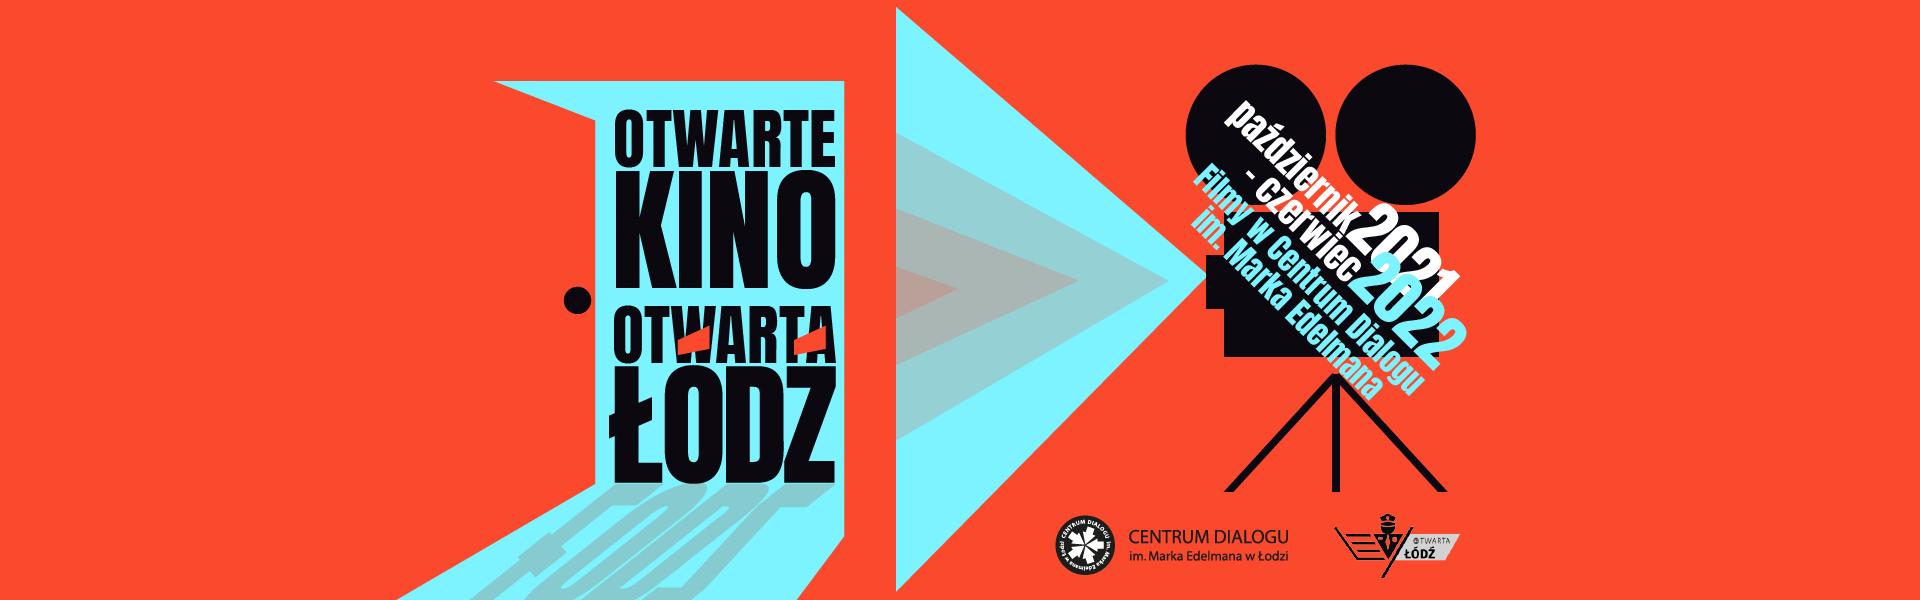 WWW_SLIDER_otwarta_lodz_otwarte_kino_social_2021-2022